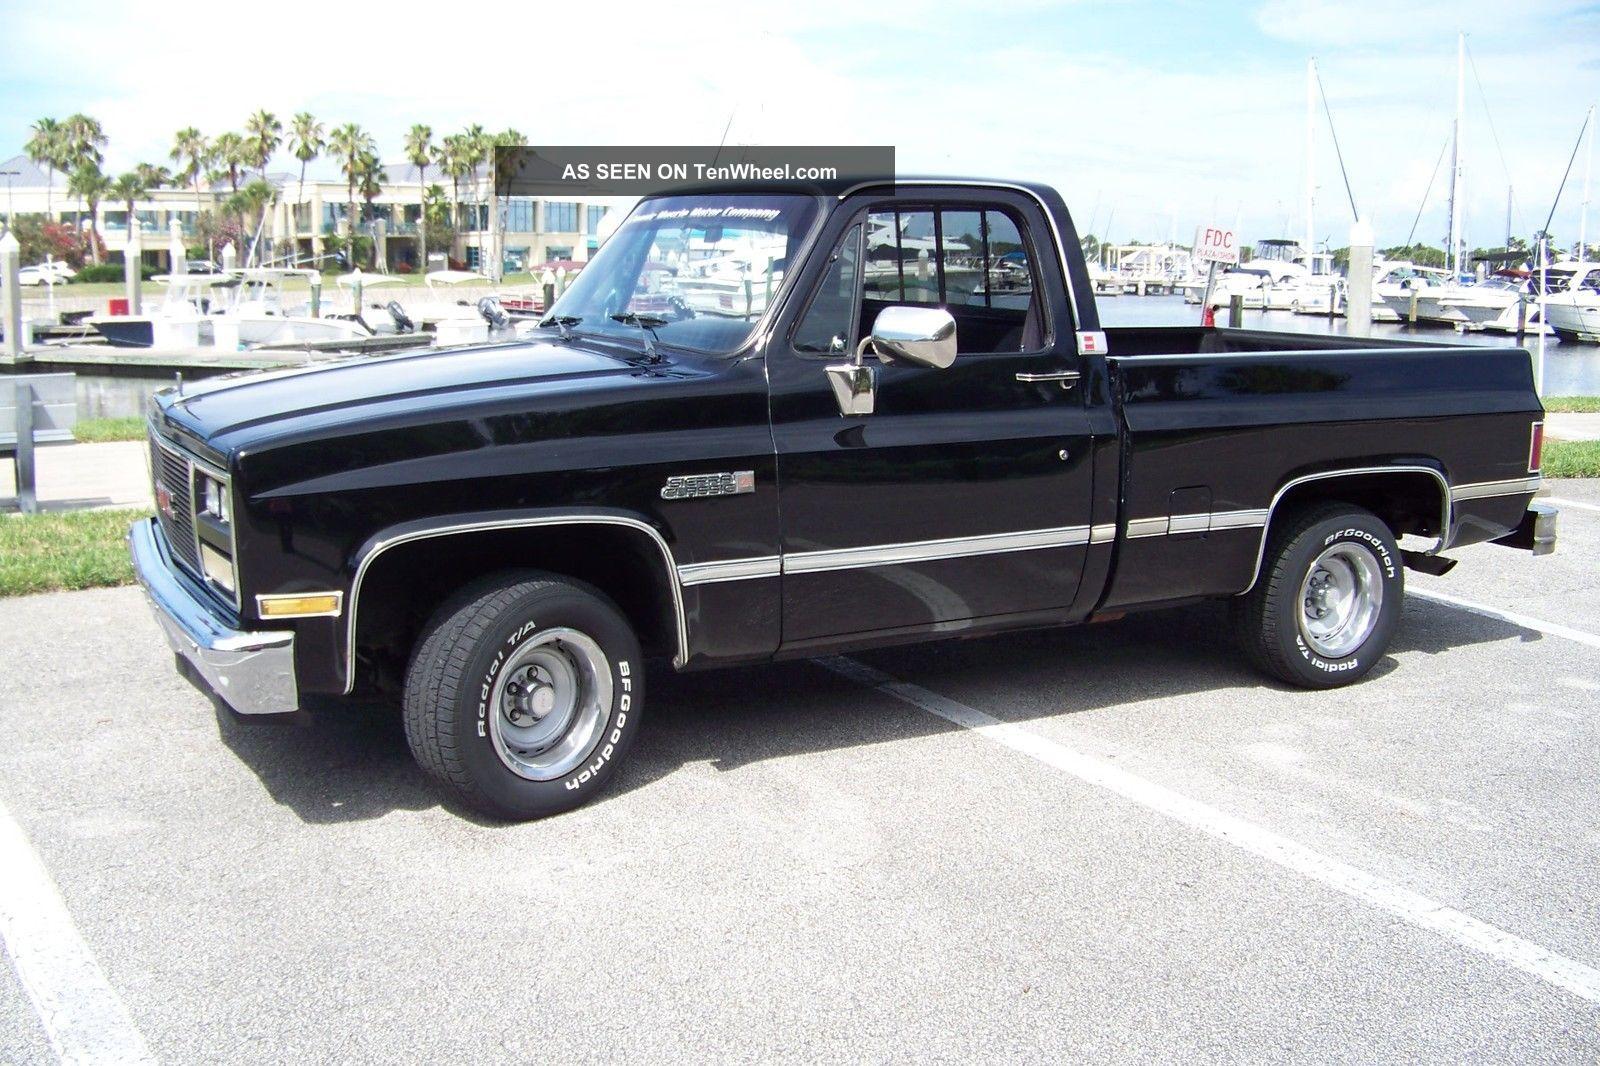 1984 Gmc Sierra Classic 1500 Pick Up Truck